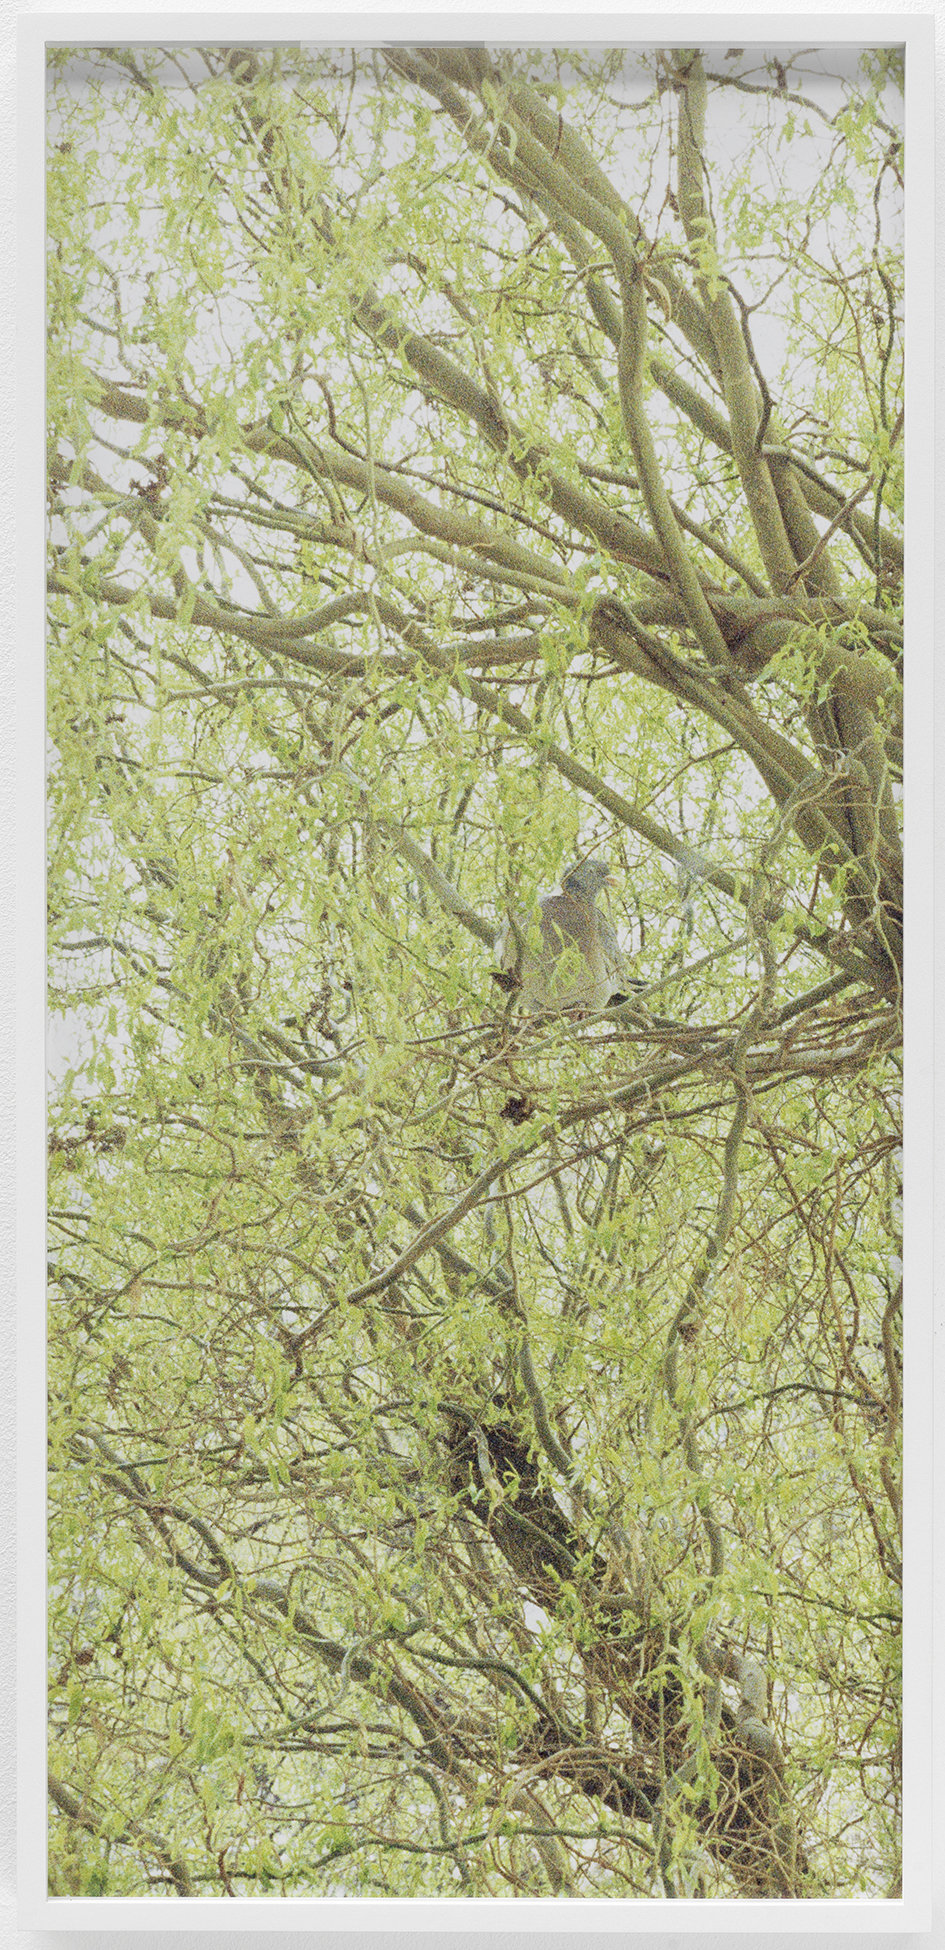 Dove, Kurfürstendamm c-print, framed 2013 72 x 33.5 cm 4/6 + 2AP